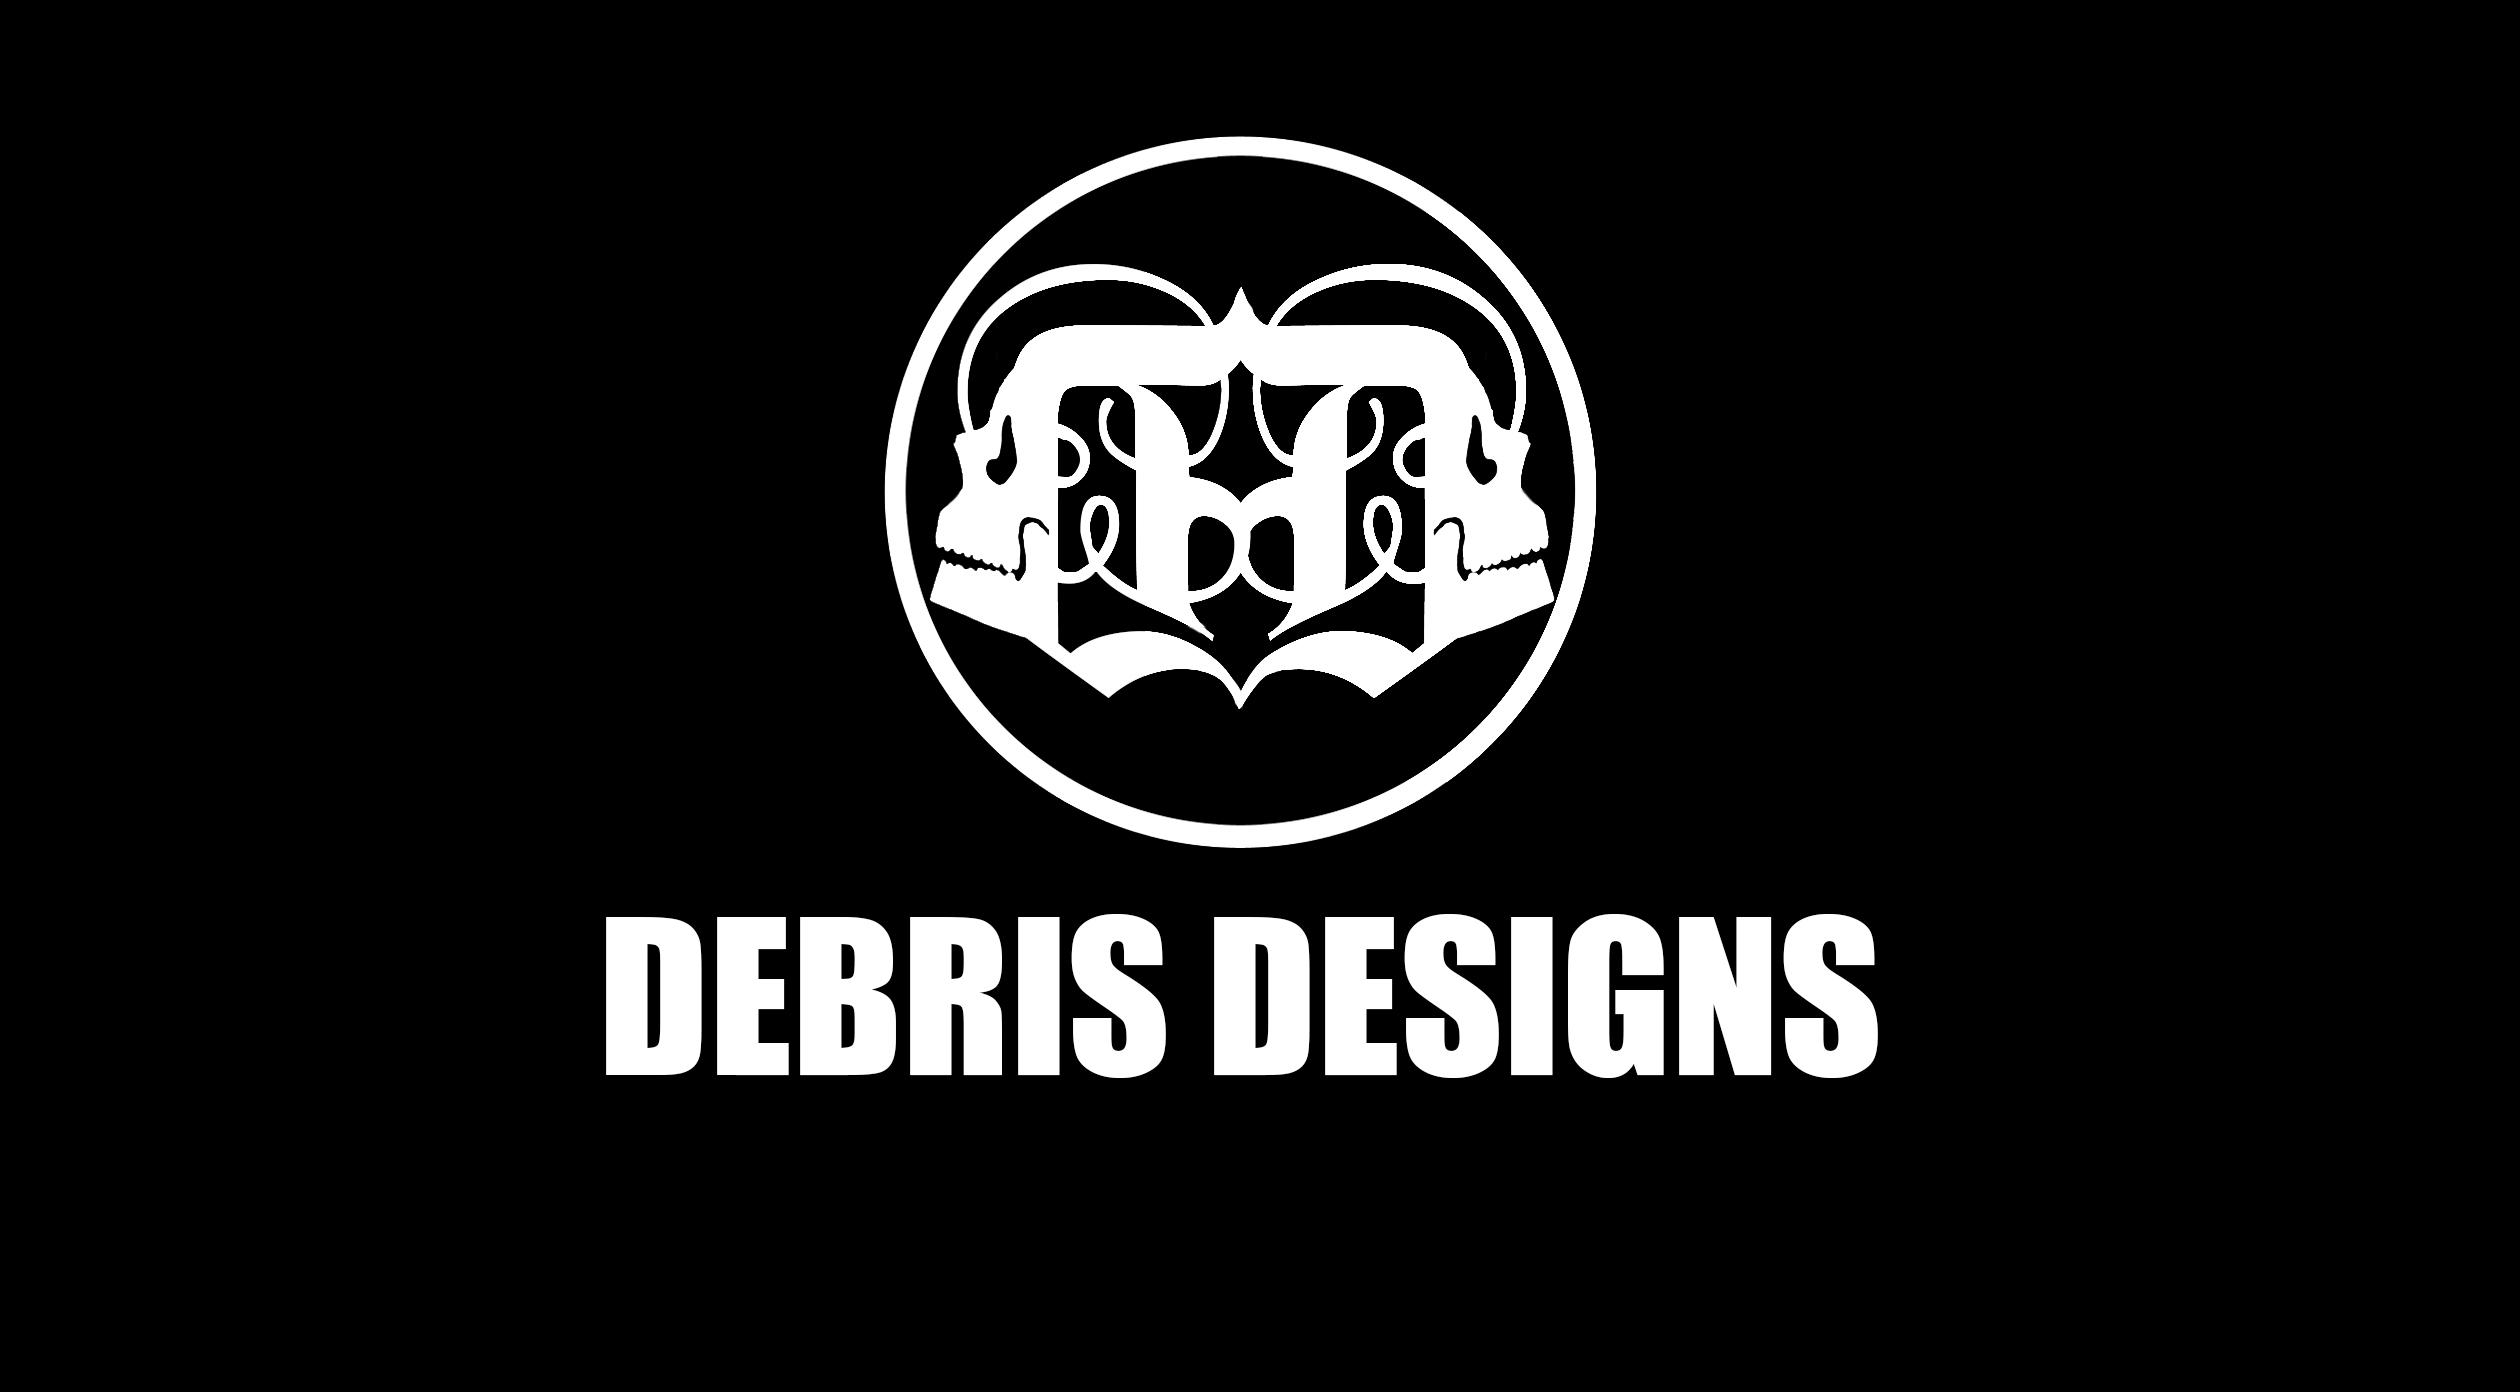 Debris Designs